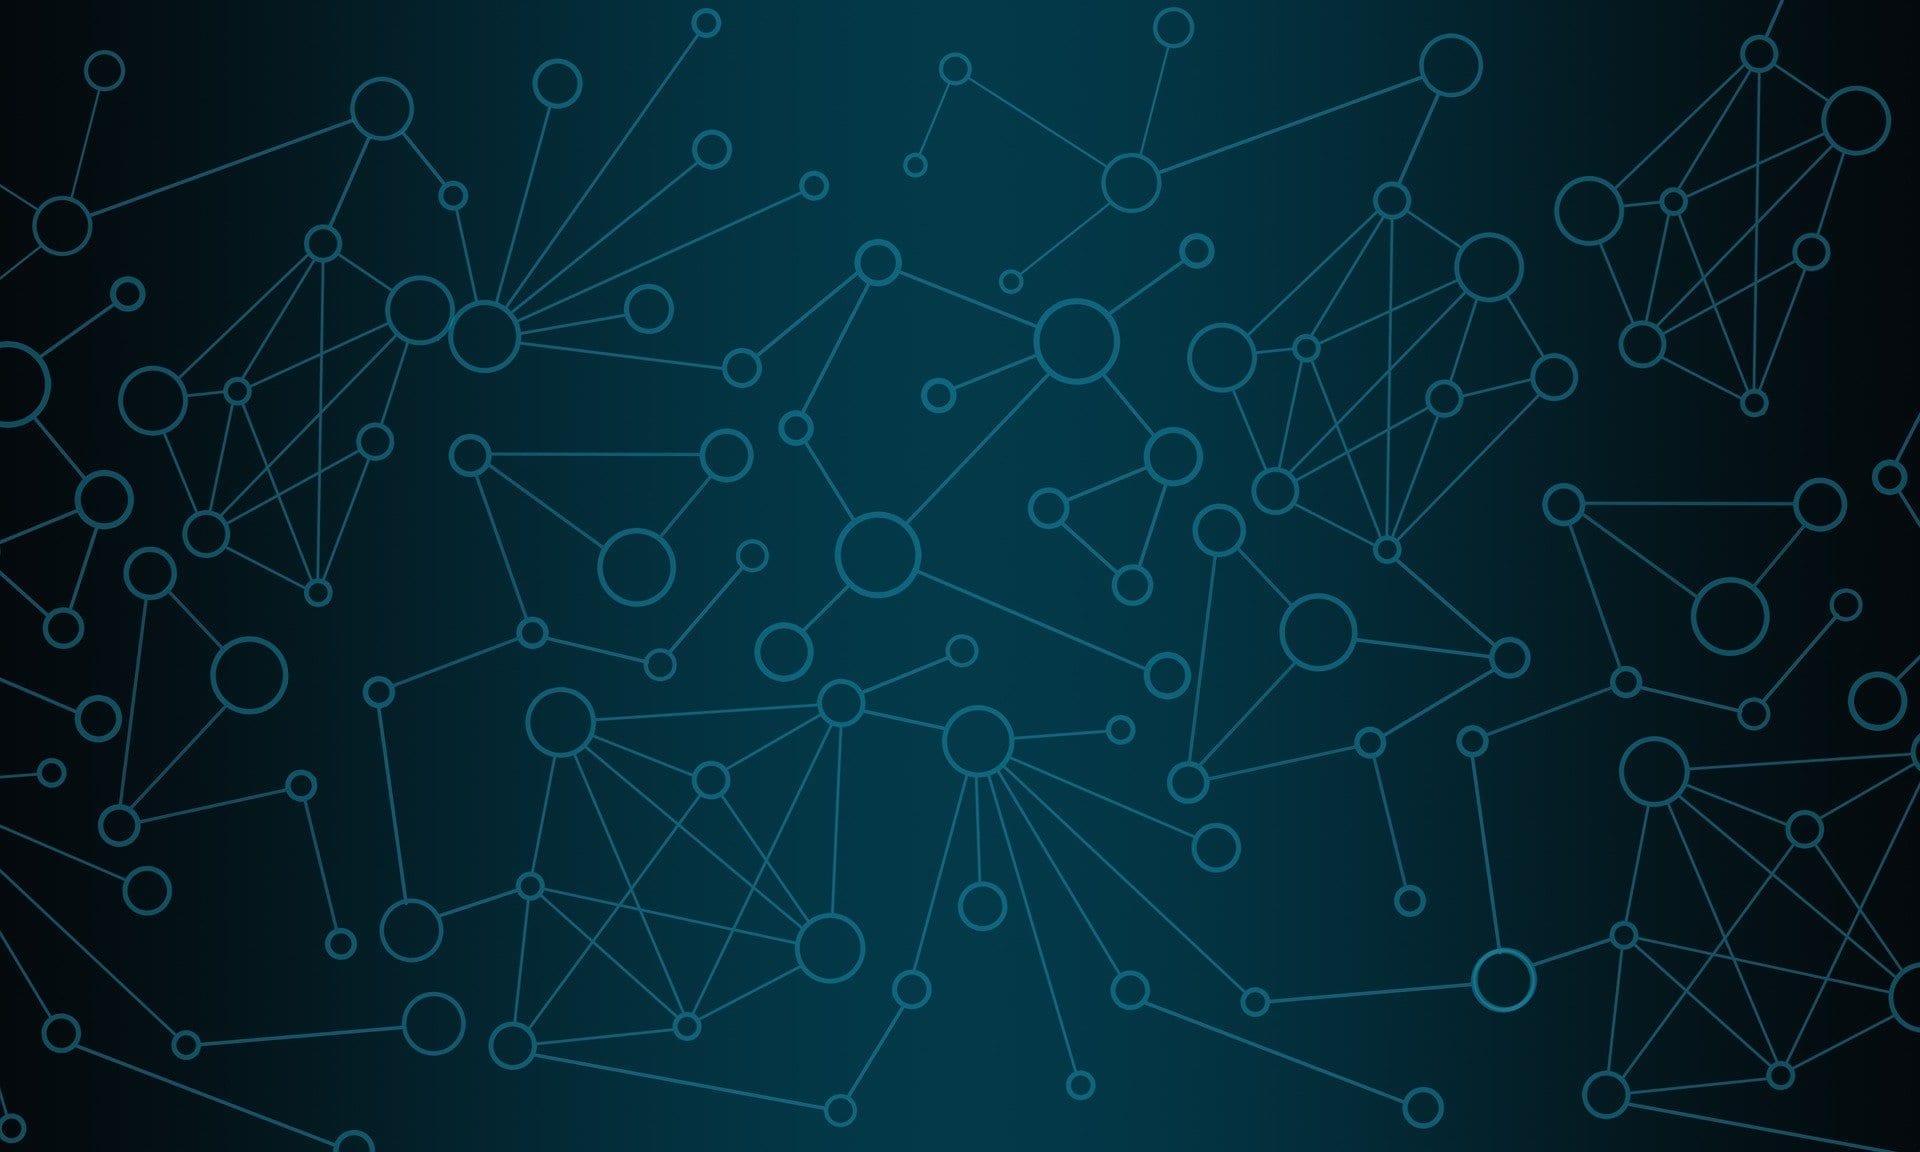 diagram of network node links